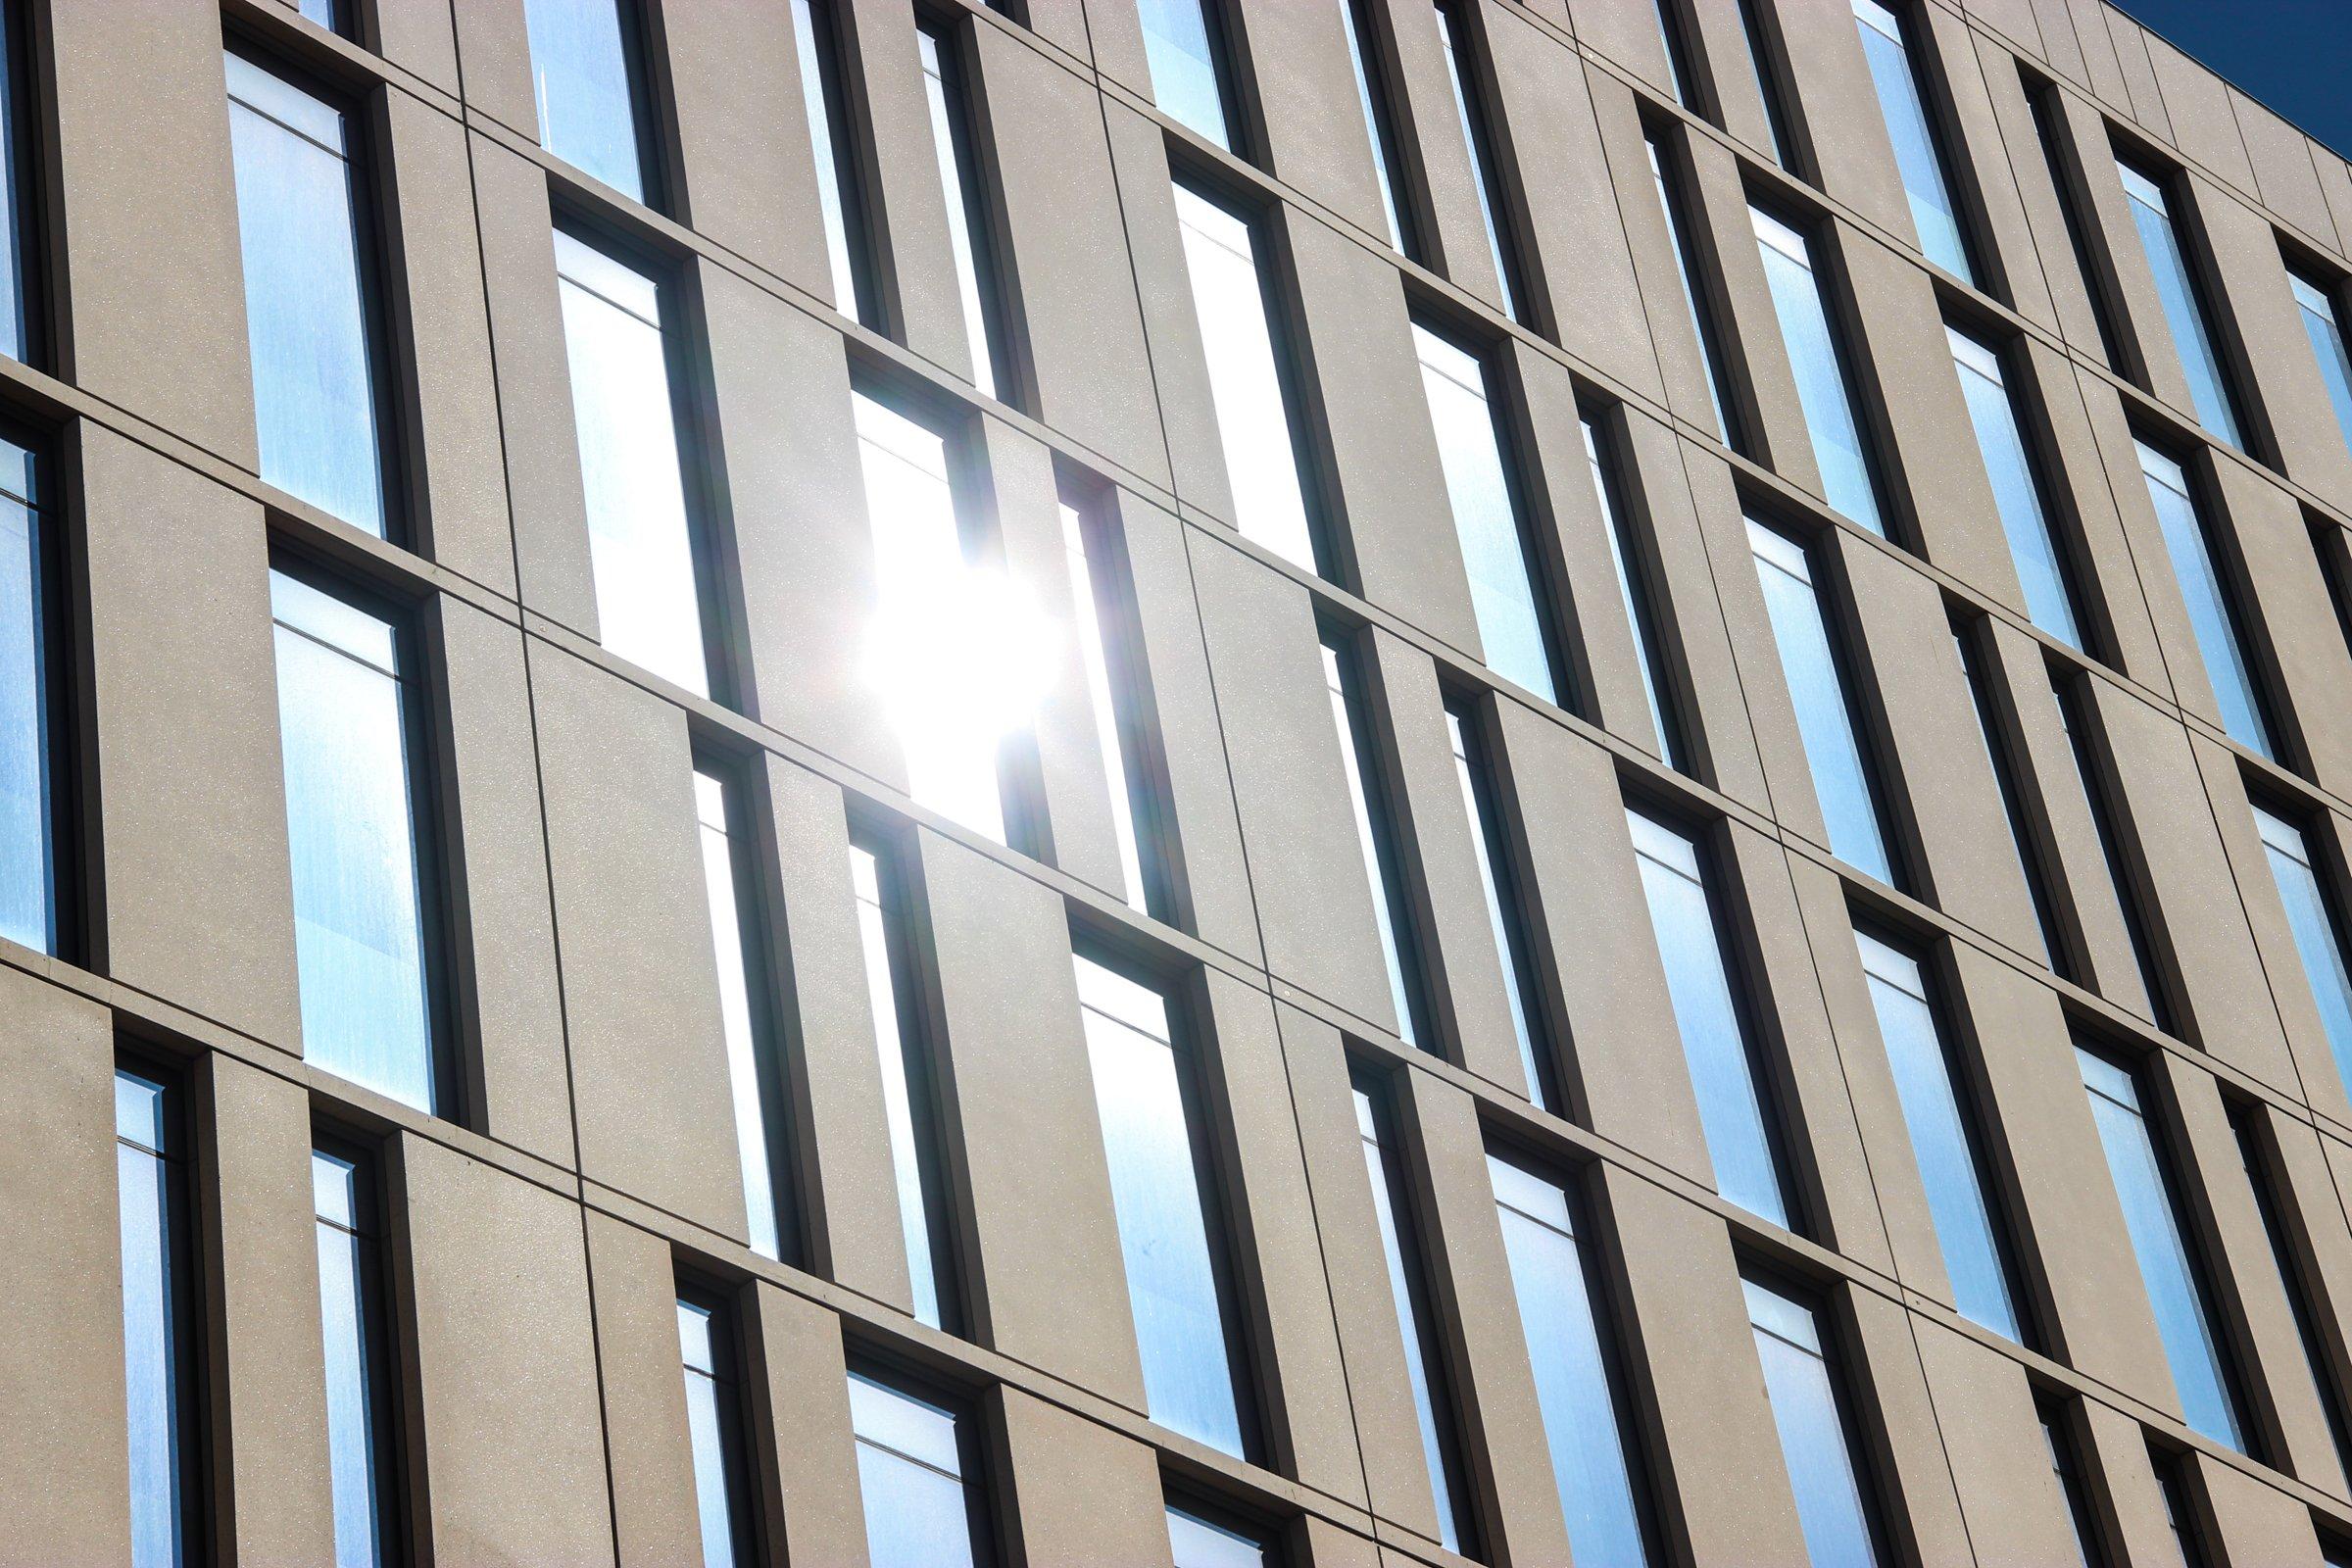 Sun Reflecting On Building Windows